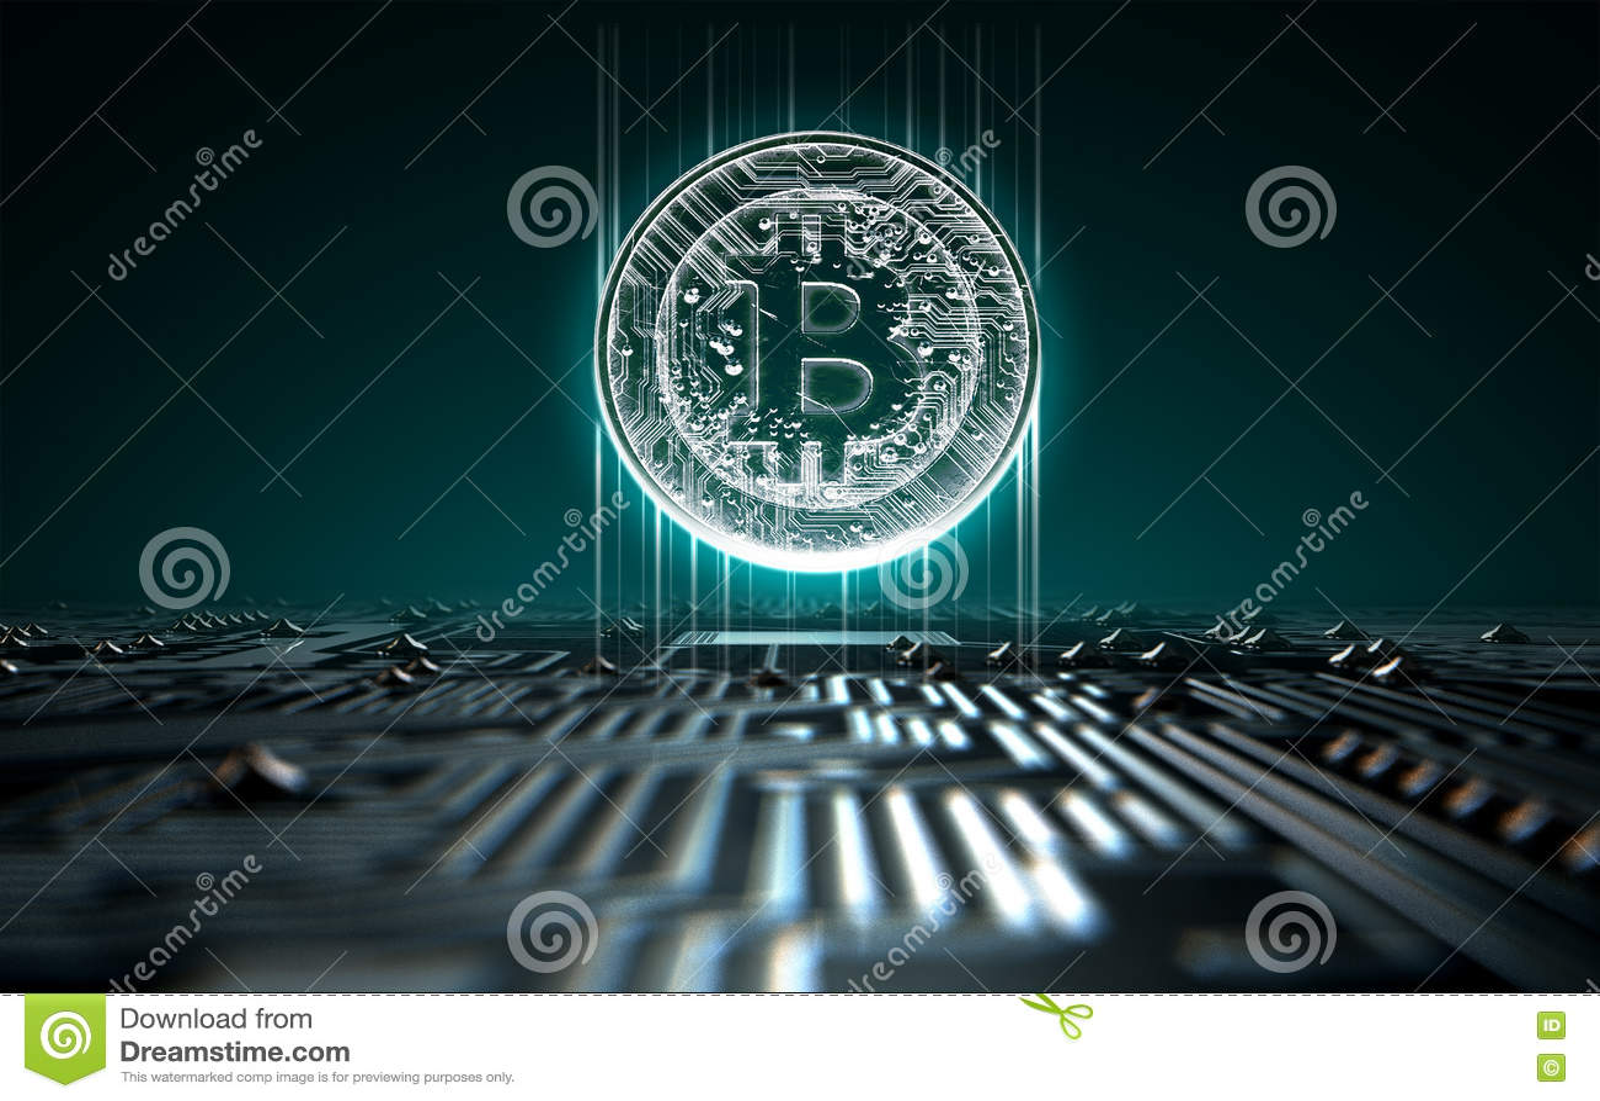 purchase a bitcoin atm